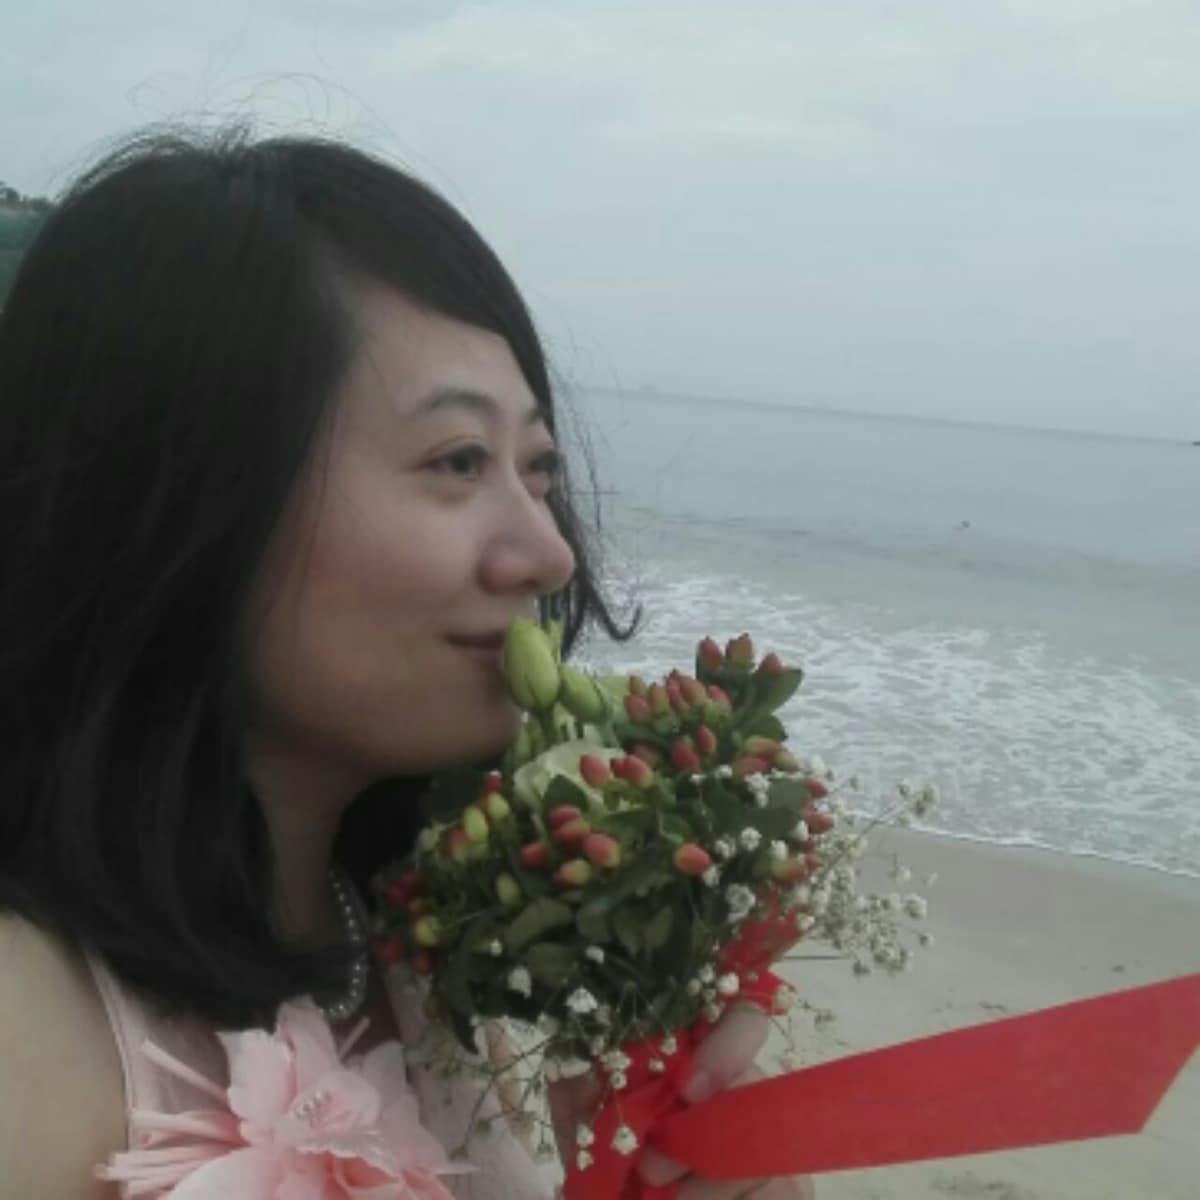 Cecilia from Shenzhen